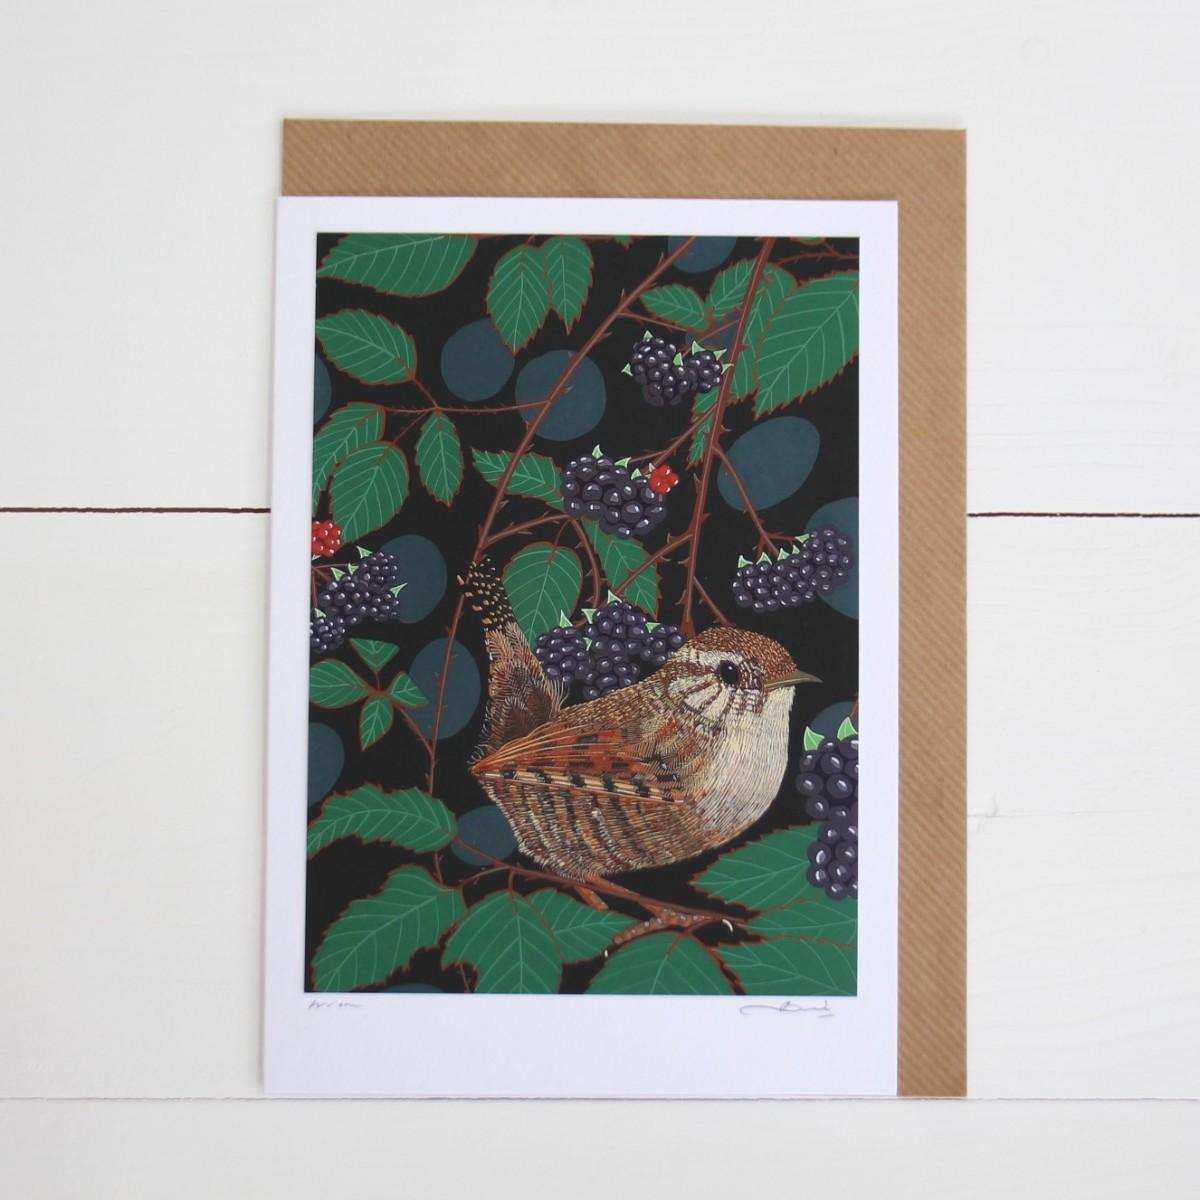 Wren Bird Flower Handmade Hand Titled And Signed Greeting Card A5